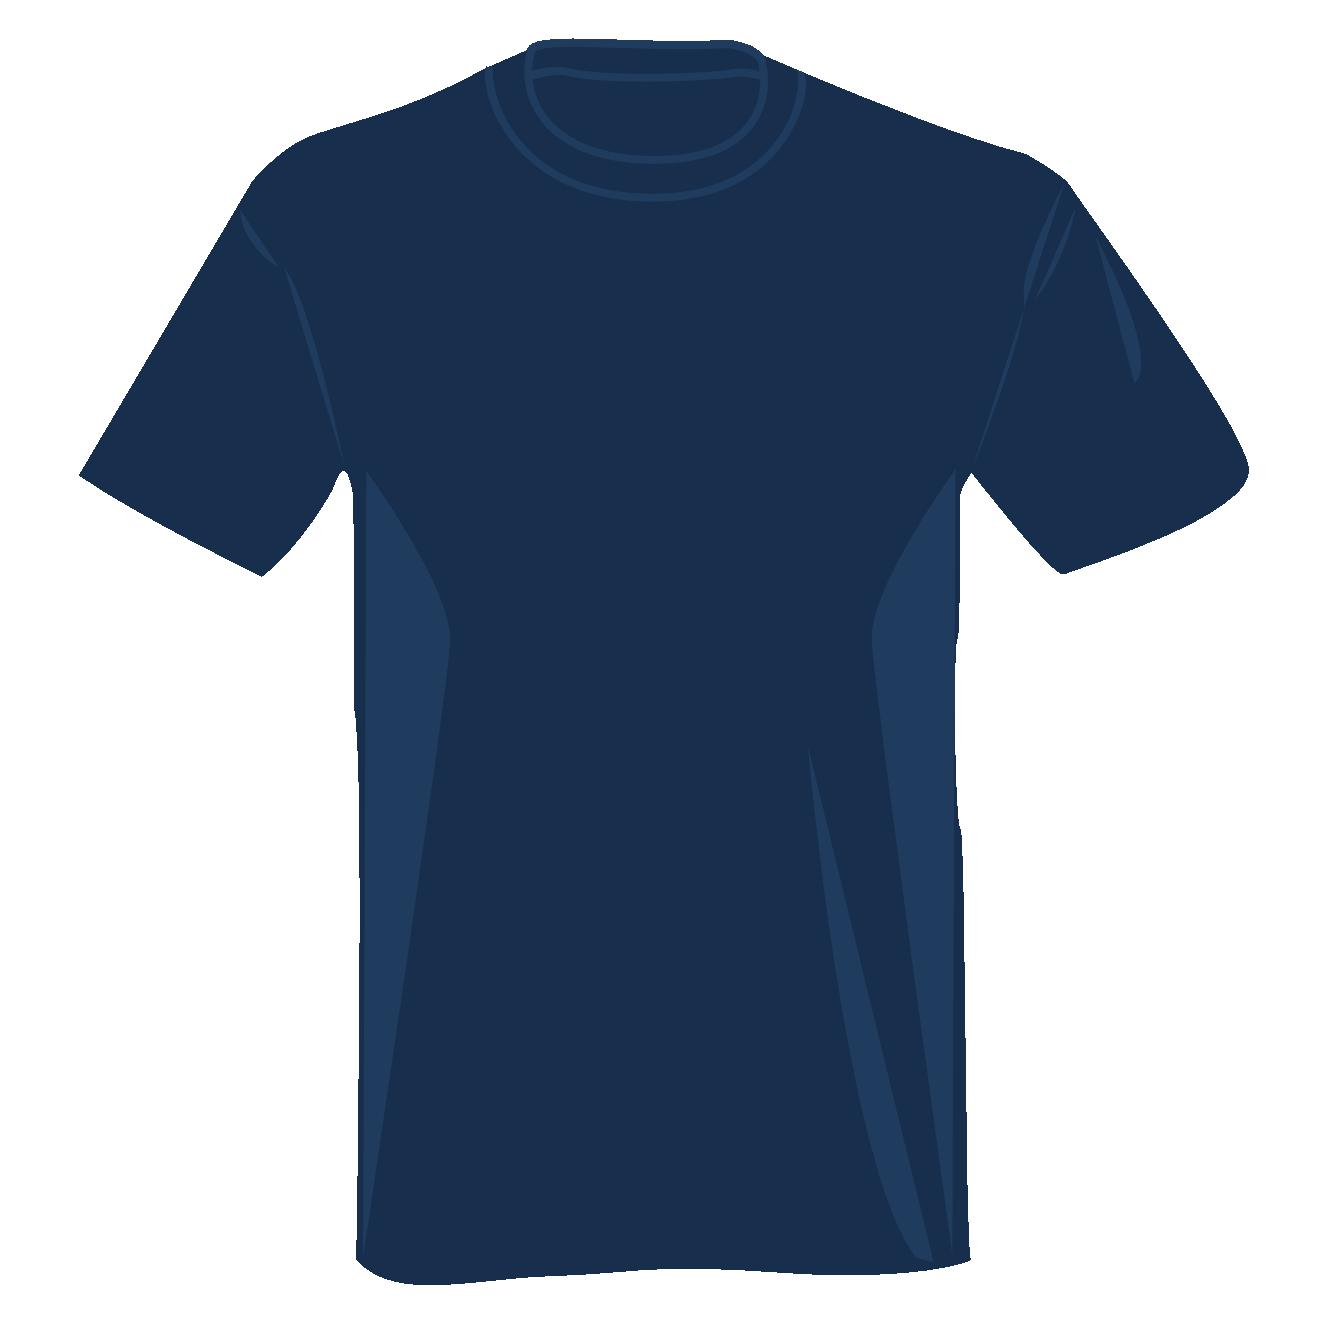 T shirt clip art sports clipart panda free clipart images for Navy blue t shirt template